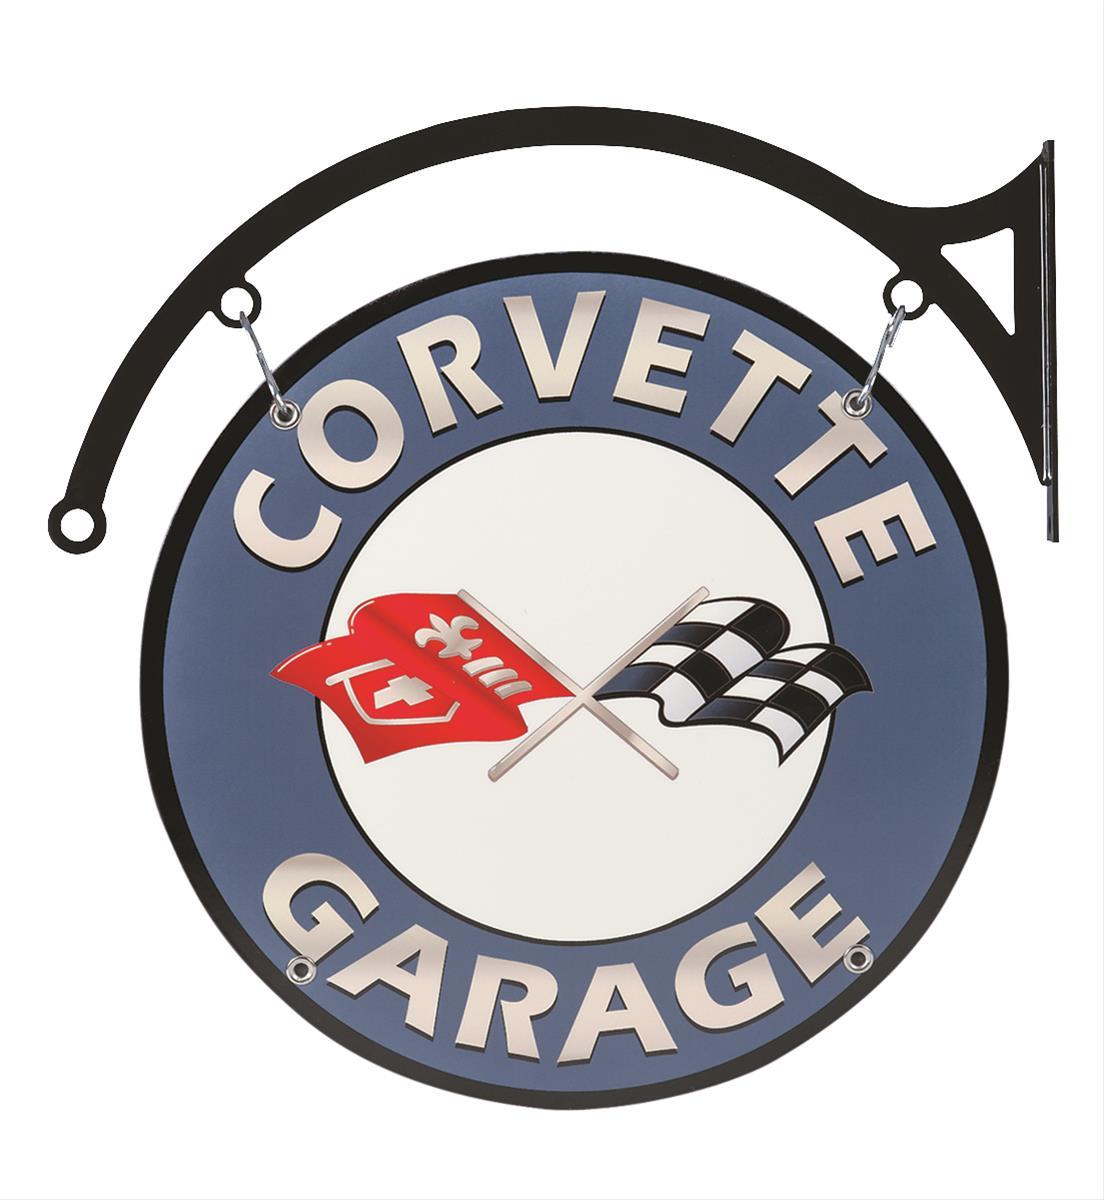 Corvette Signs Garage : Double sided corvette garage sign with bracket vet ds